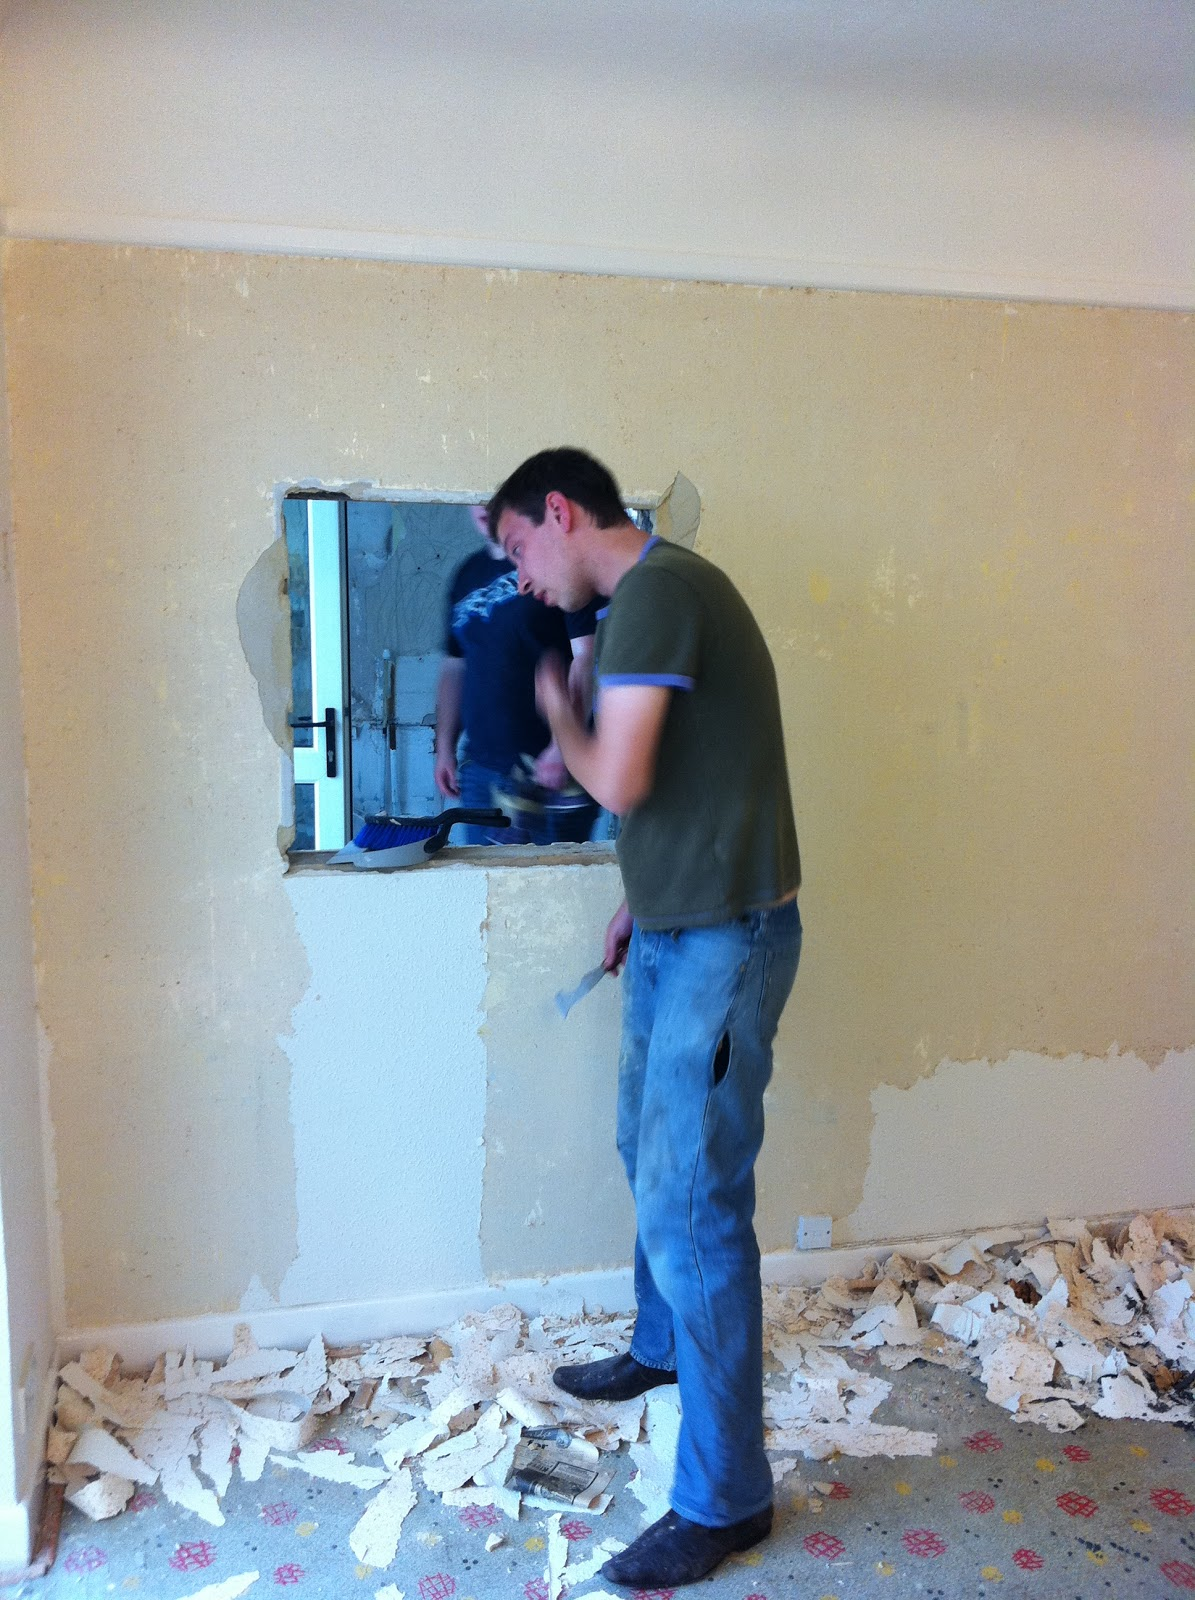 Beneath the Woodchip Wallpaper: The smashing begins!